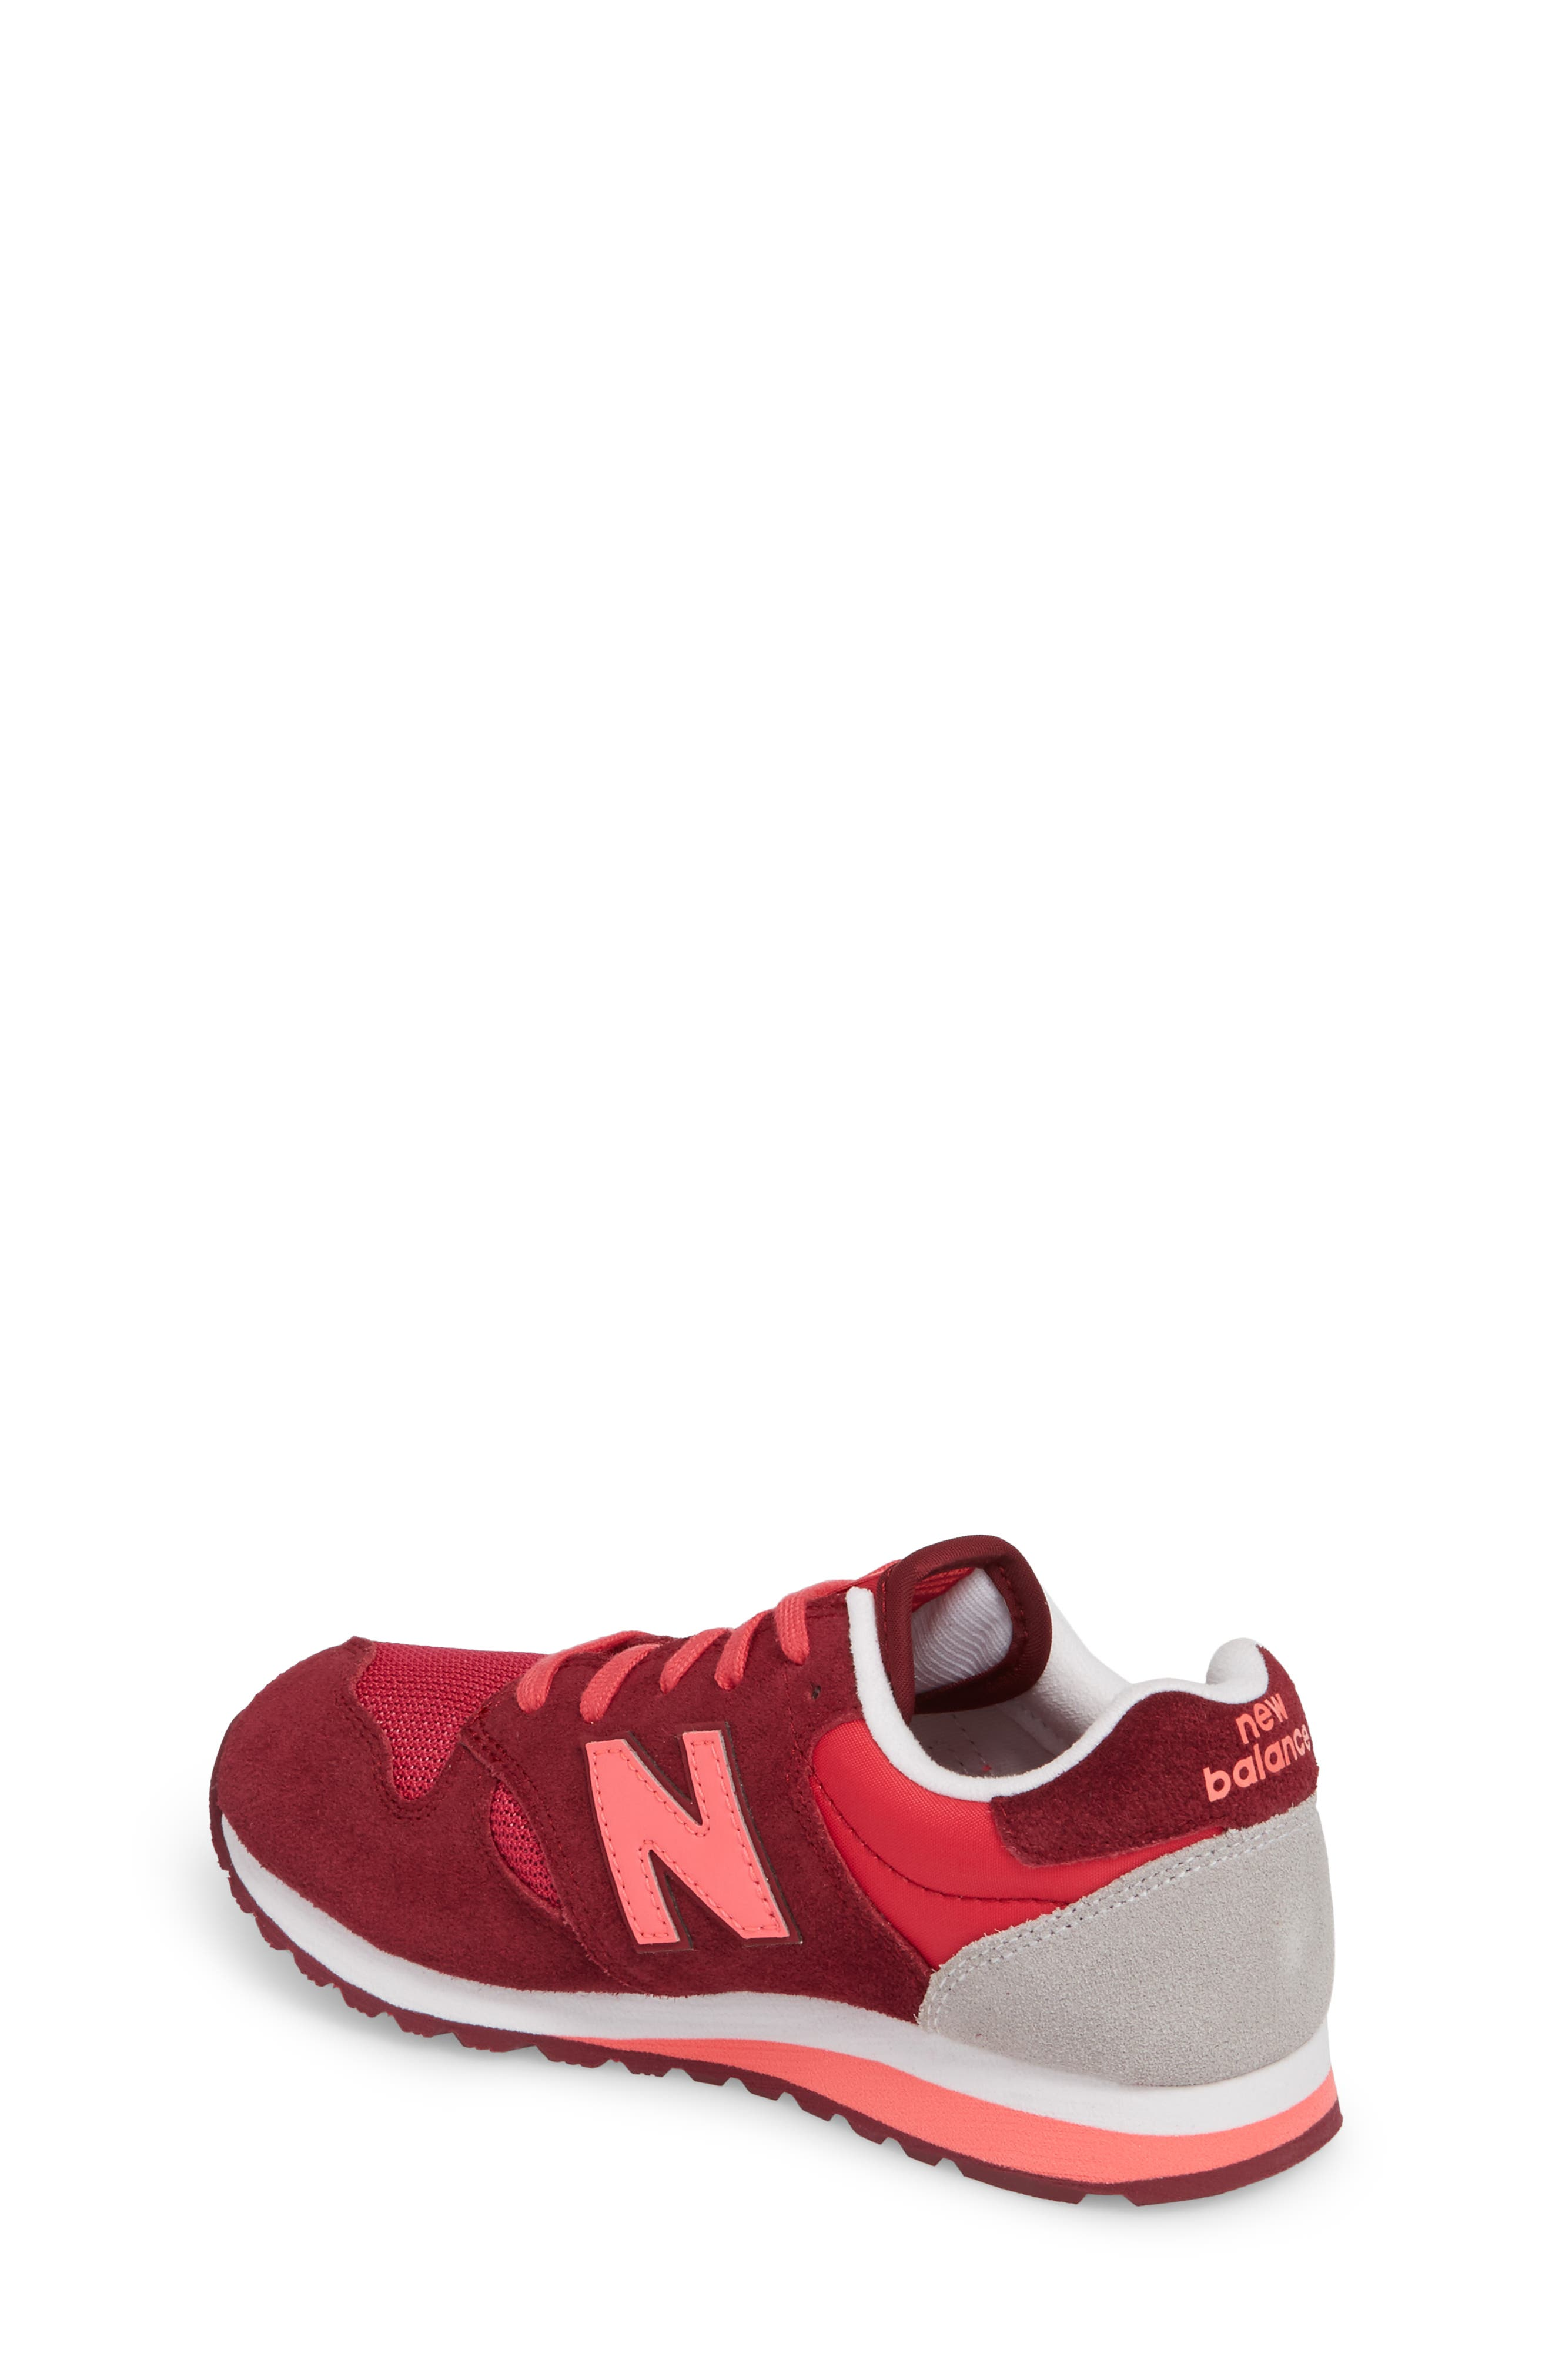 520 Sneaker,                             Alternate thumbnail 2, color,                             Pink/ Purple